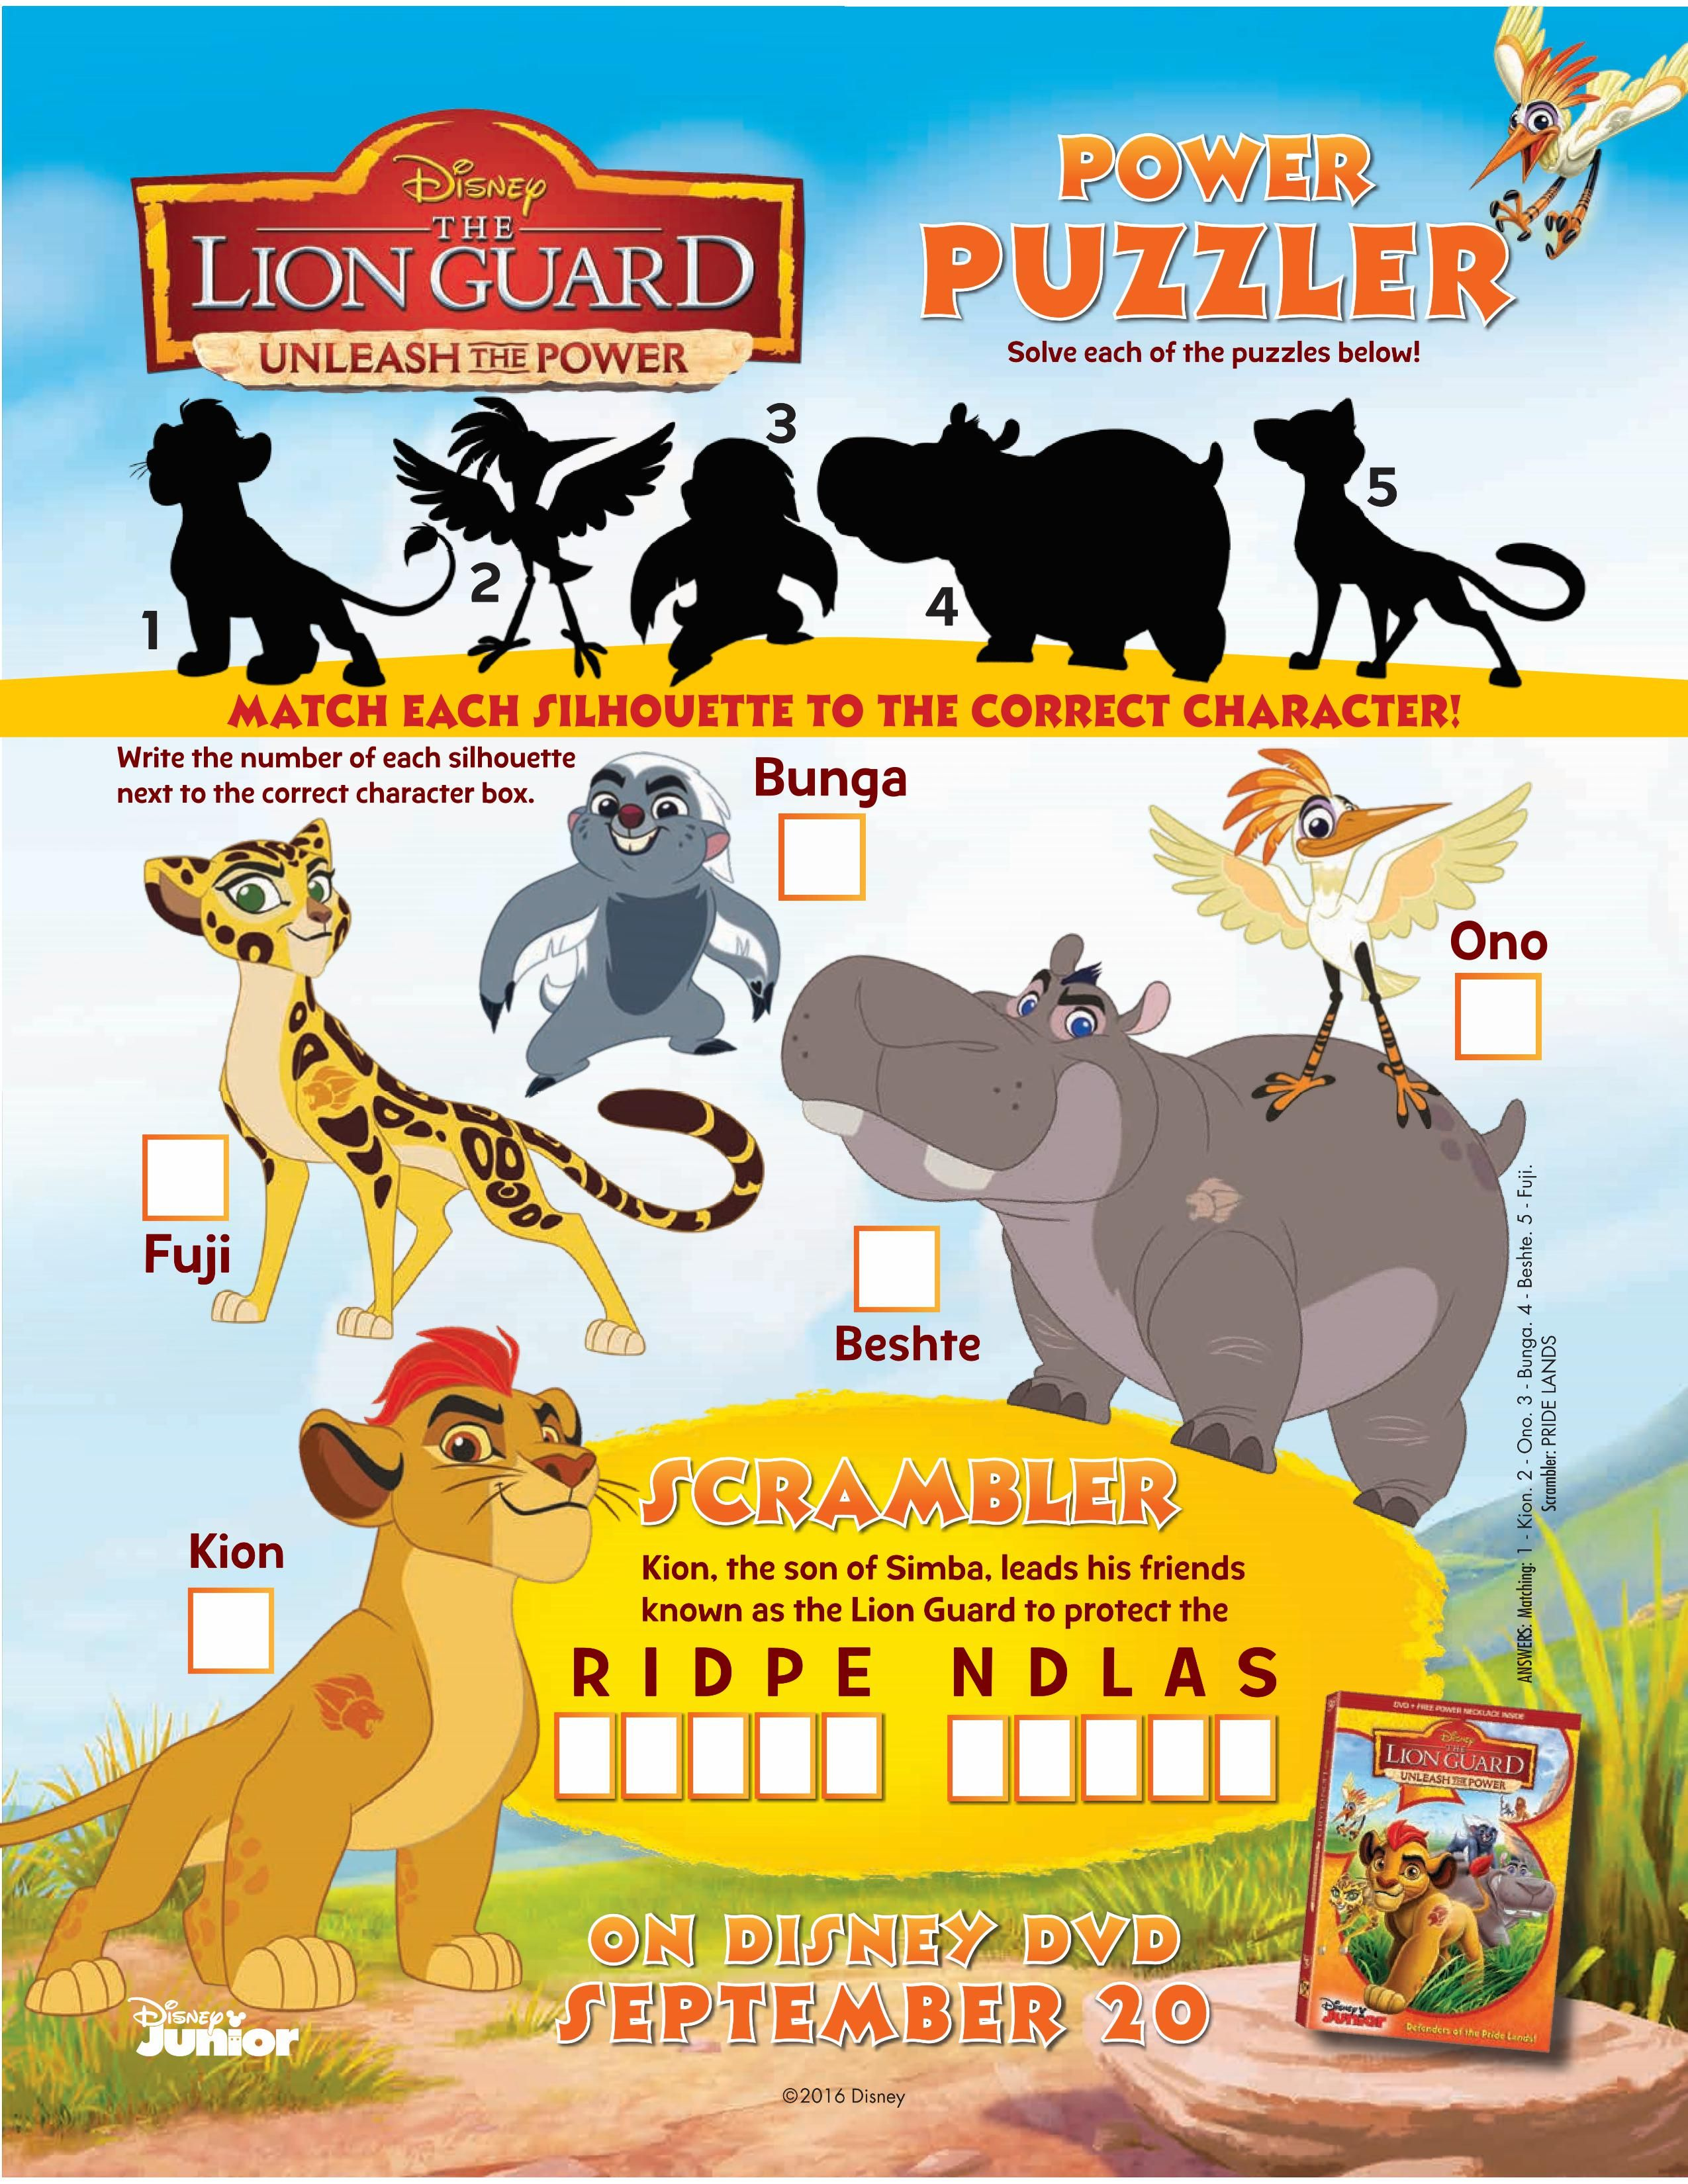 Printable Disney Lion Guard Puzzle Page Printable